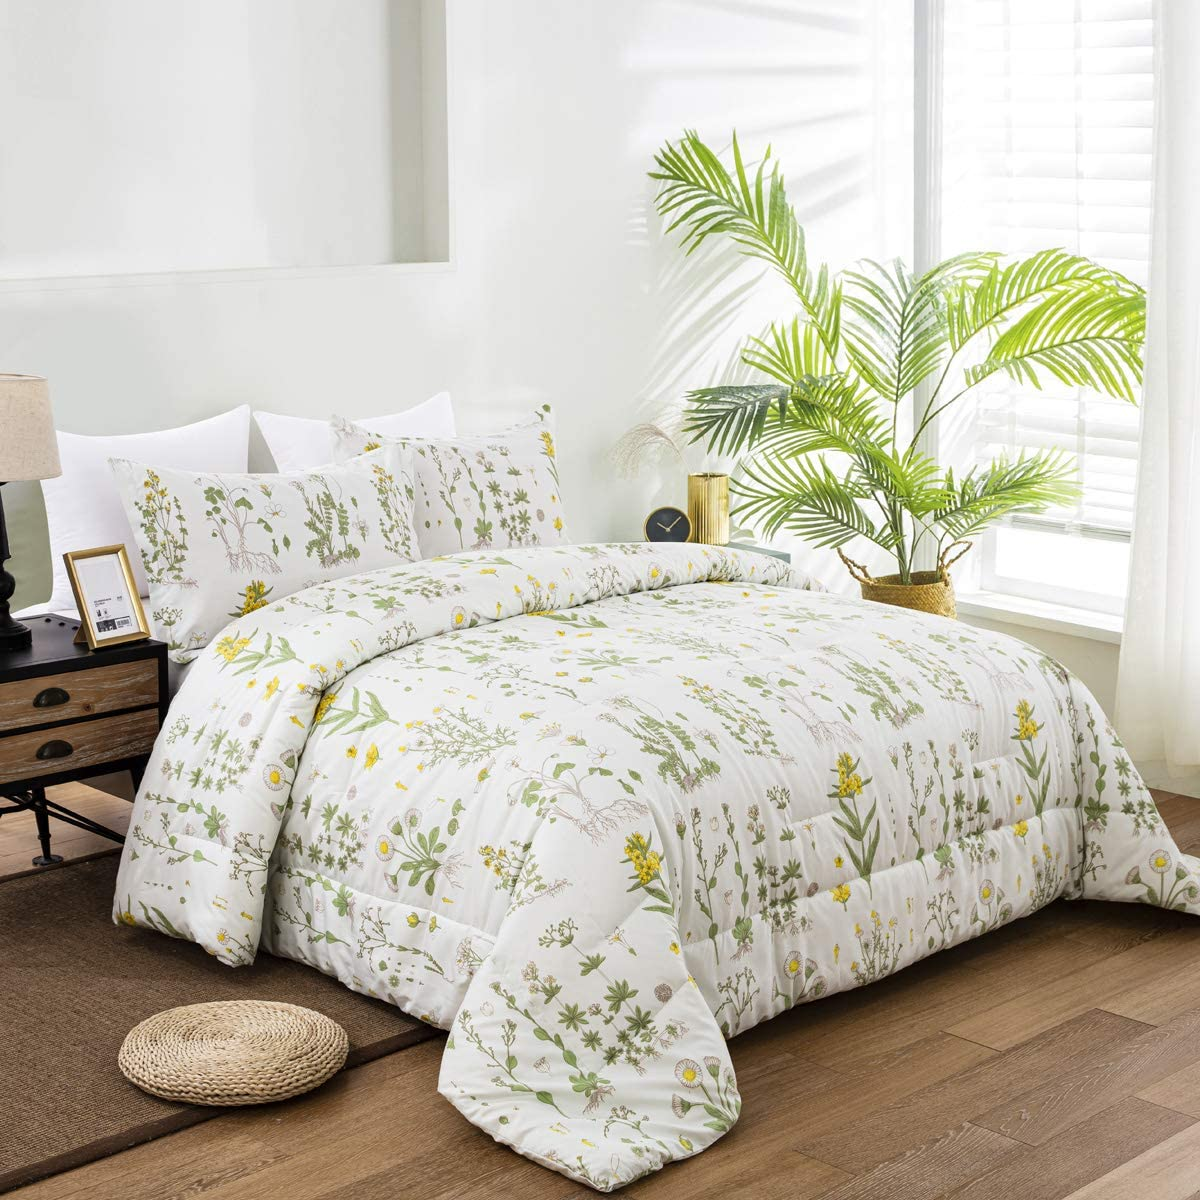 "Floral Comforter Set Queen Plant Botanical Duvet Green Leaves Yellow Flower Floral Garden Pattern on Light Green Not Pure White Bedding Set 3 Pieces Comforter with 2 Pillowcases 90""x90"" (Light Green)"